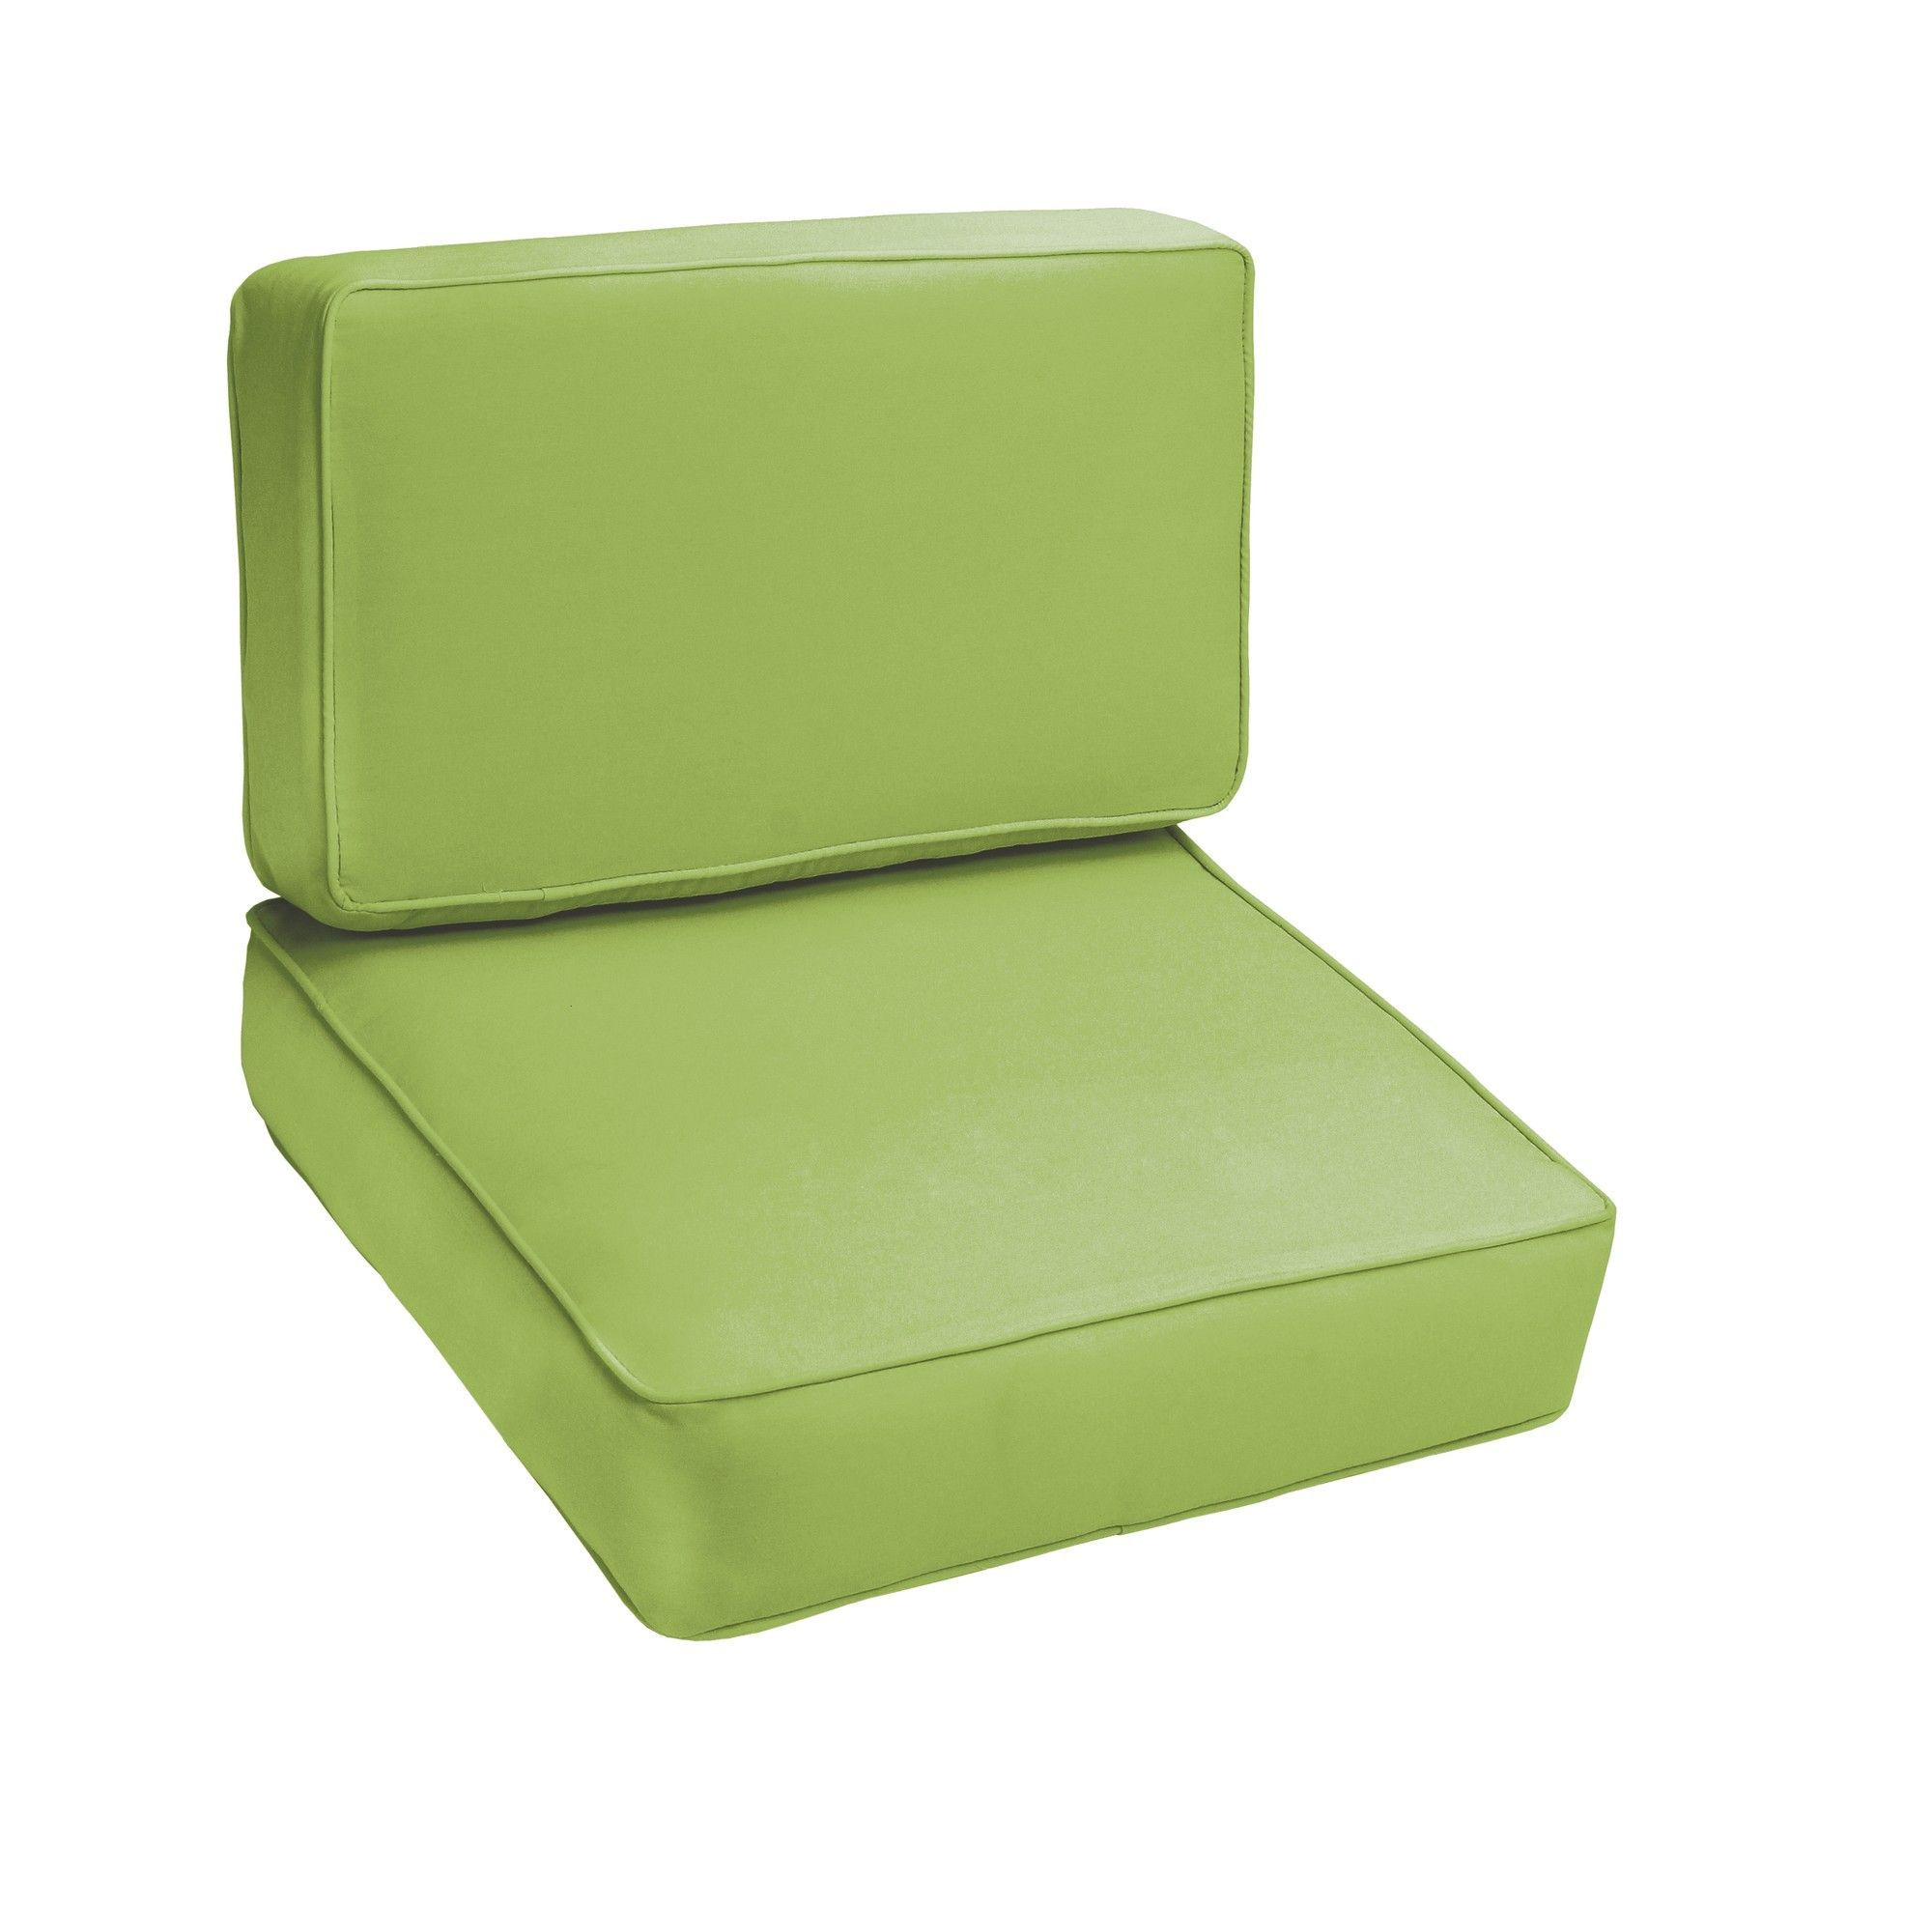 Selene outdoor sofa cushion products pinterest outdoor sofa